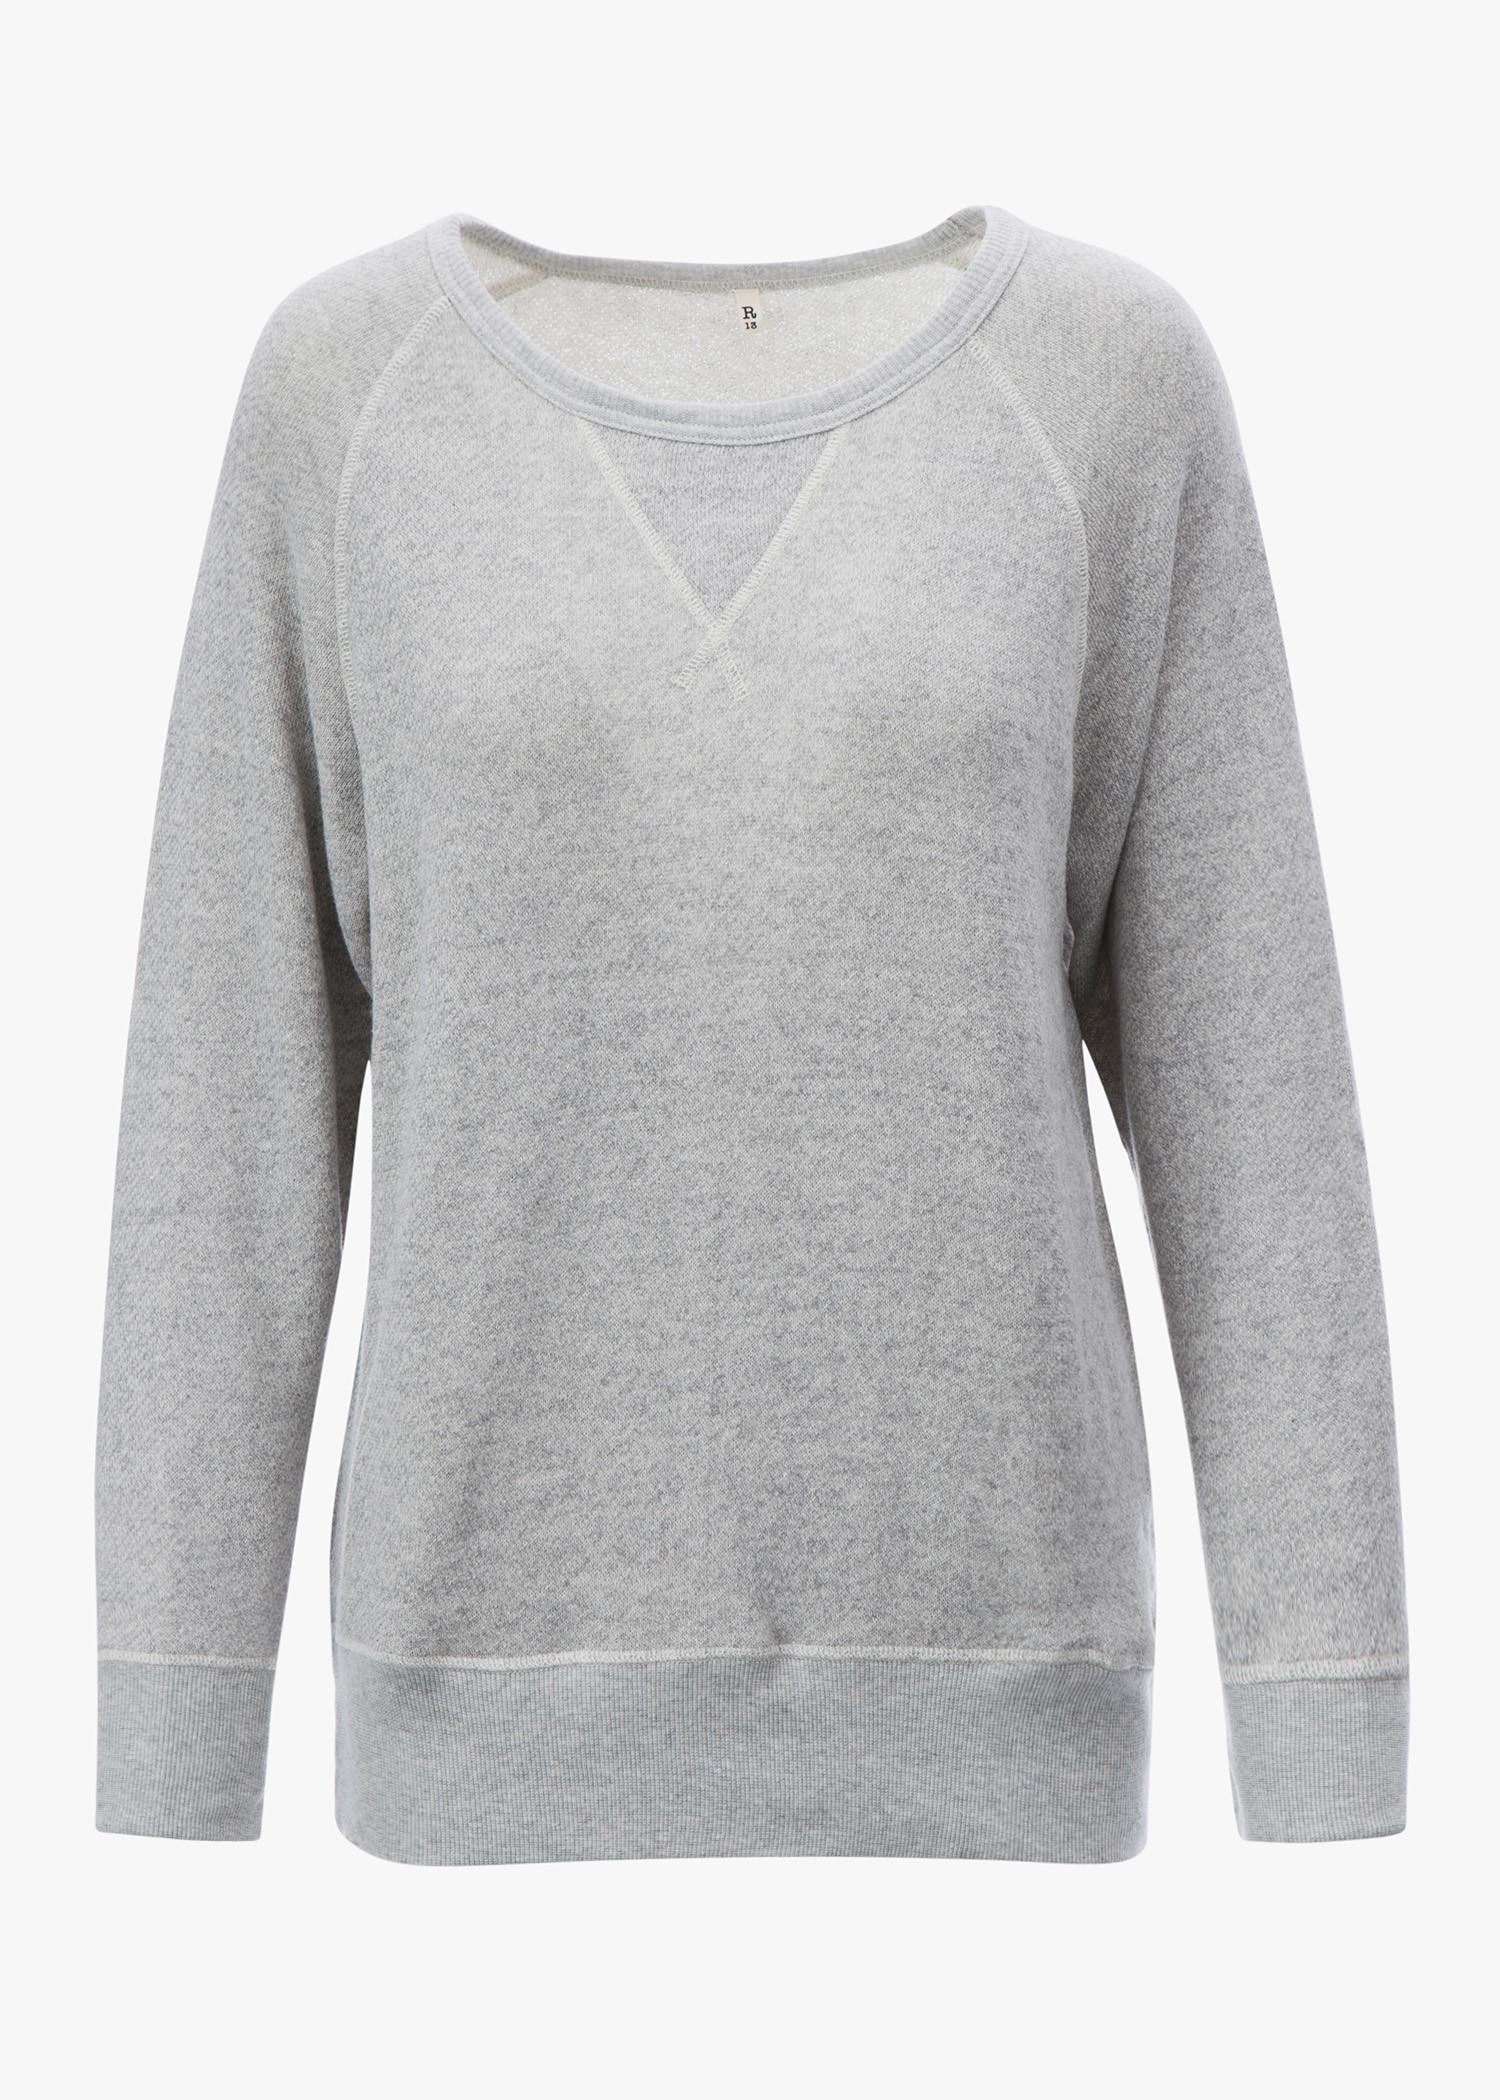 R13 Sweatshirt In Light Heather